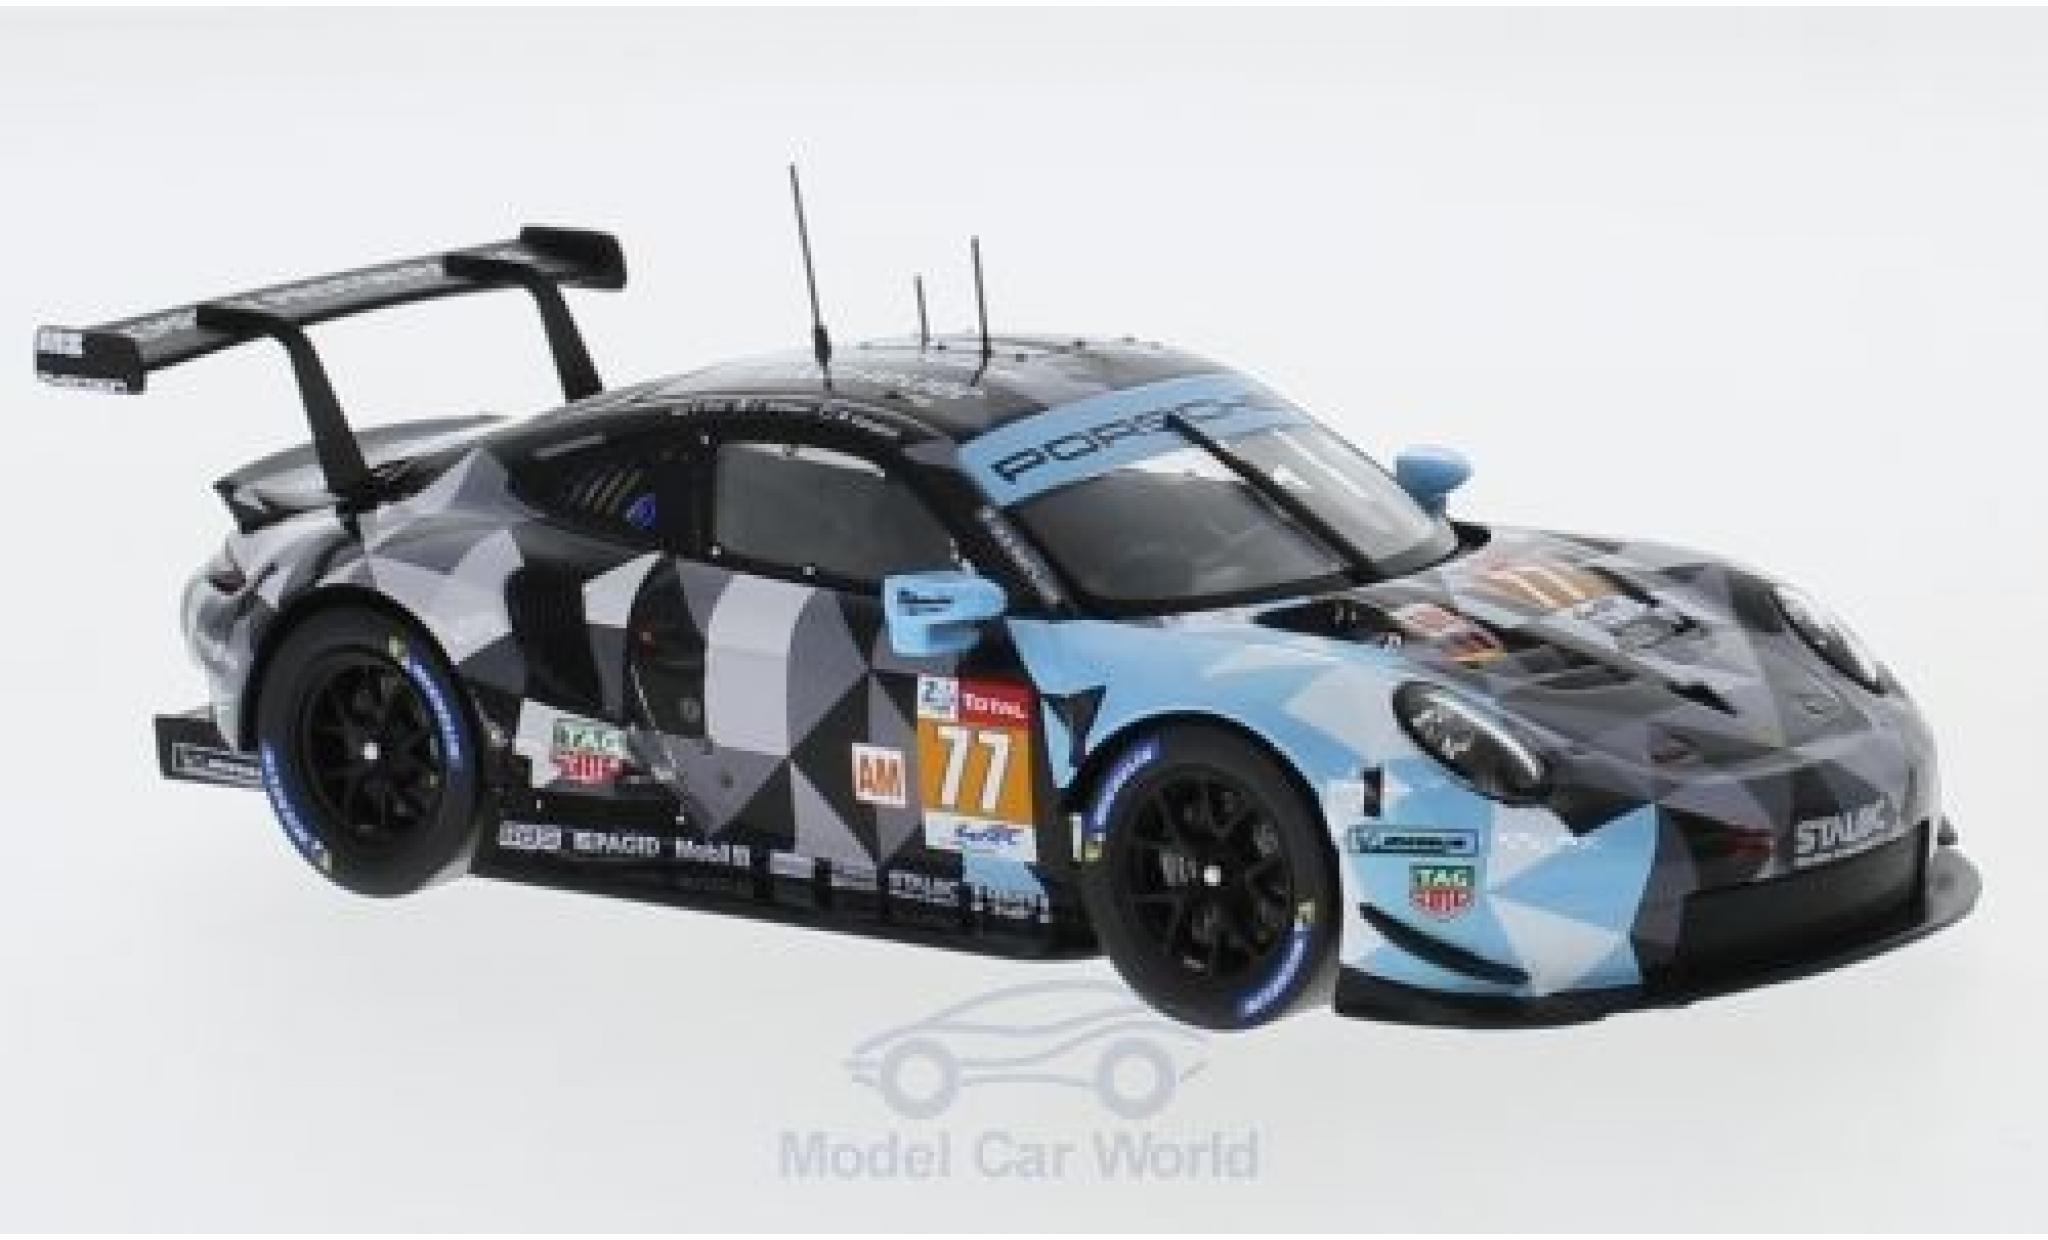 Porsche 991 RSR 1/43 Spark 911 ( II) No.77 Dempsey Predon Racing WEC 2018 C.Ried/J.Andlauer/M.Campbell